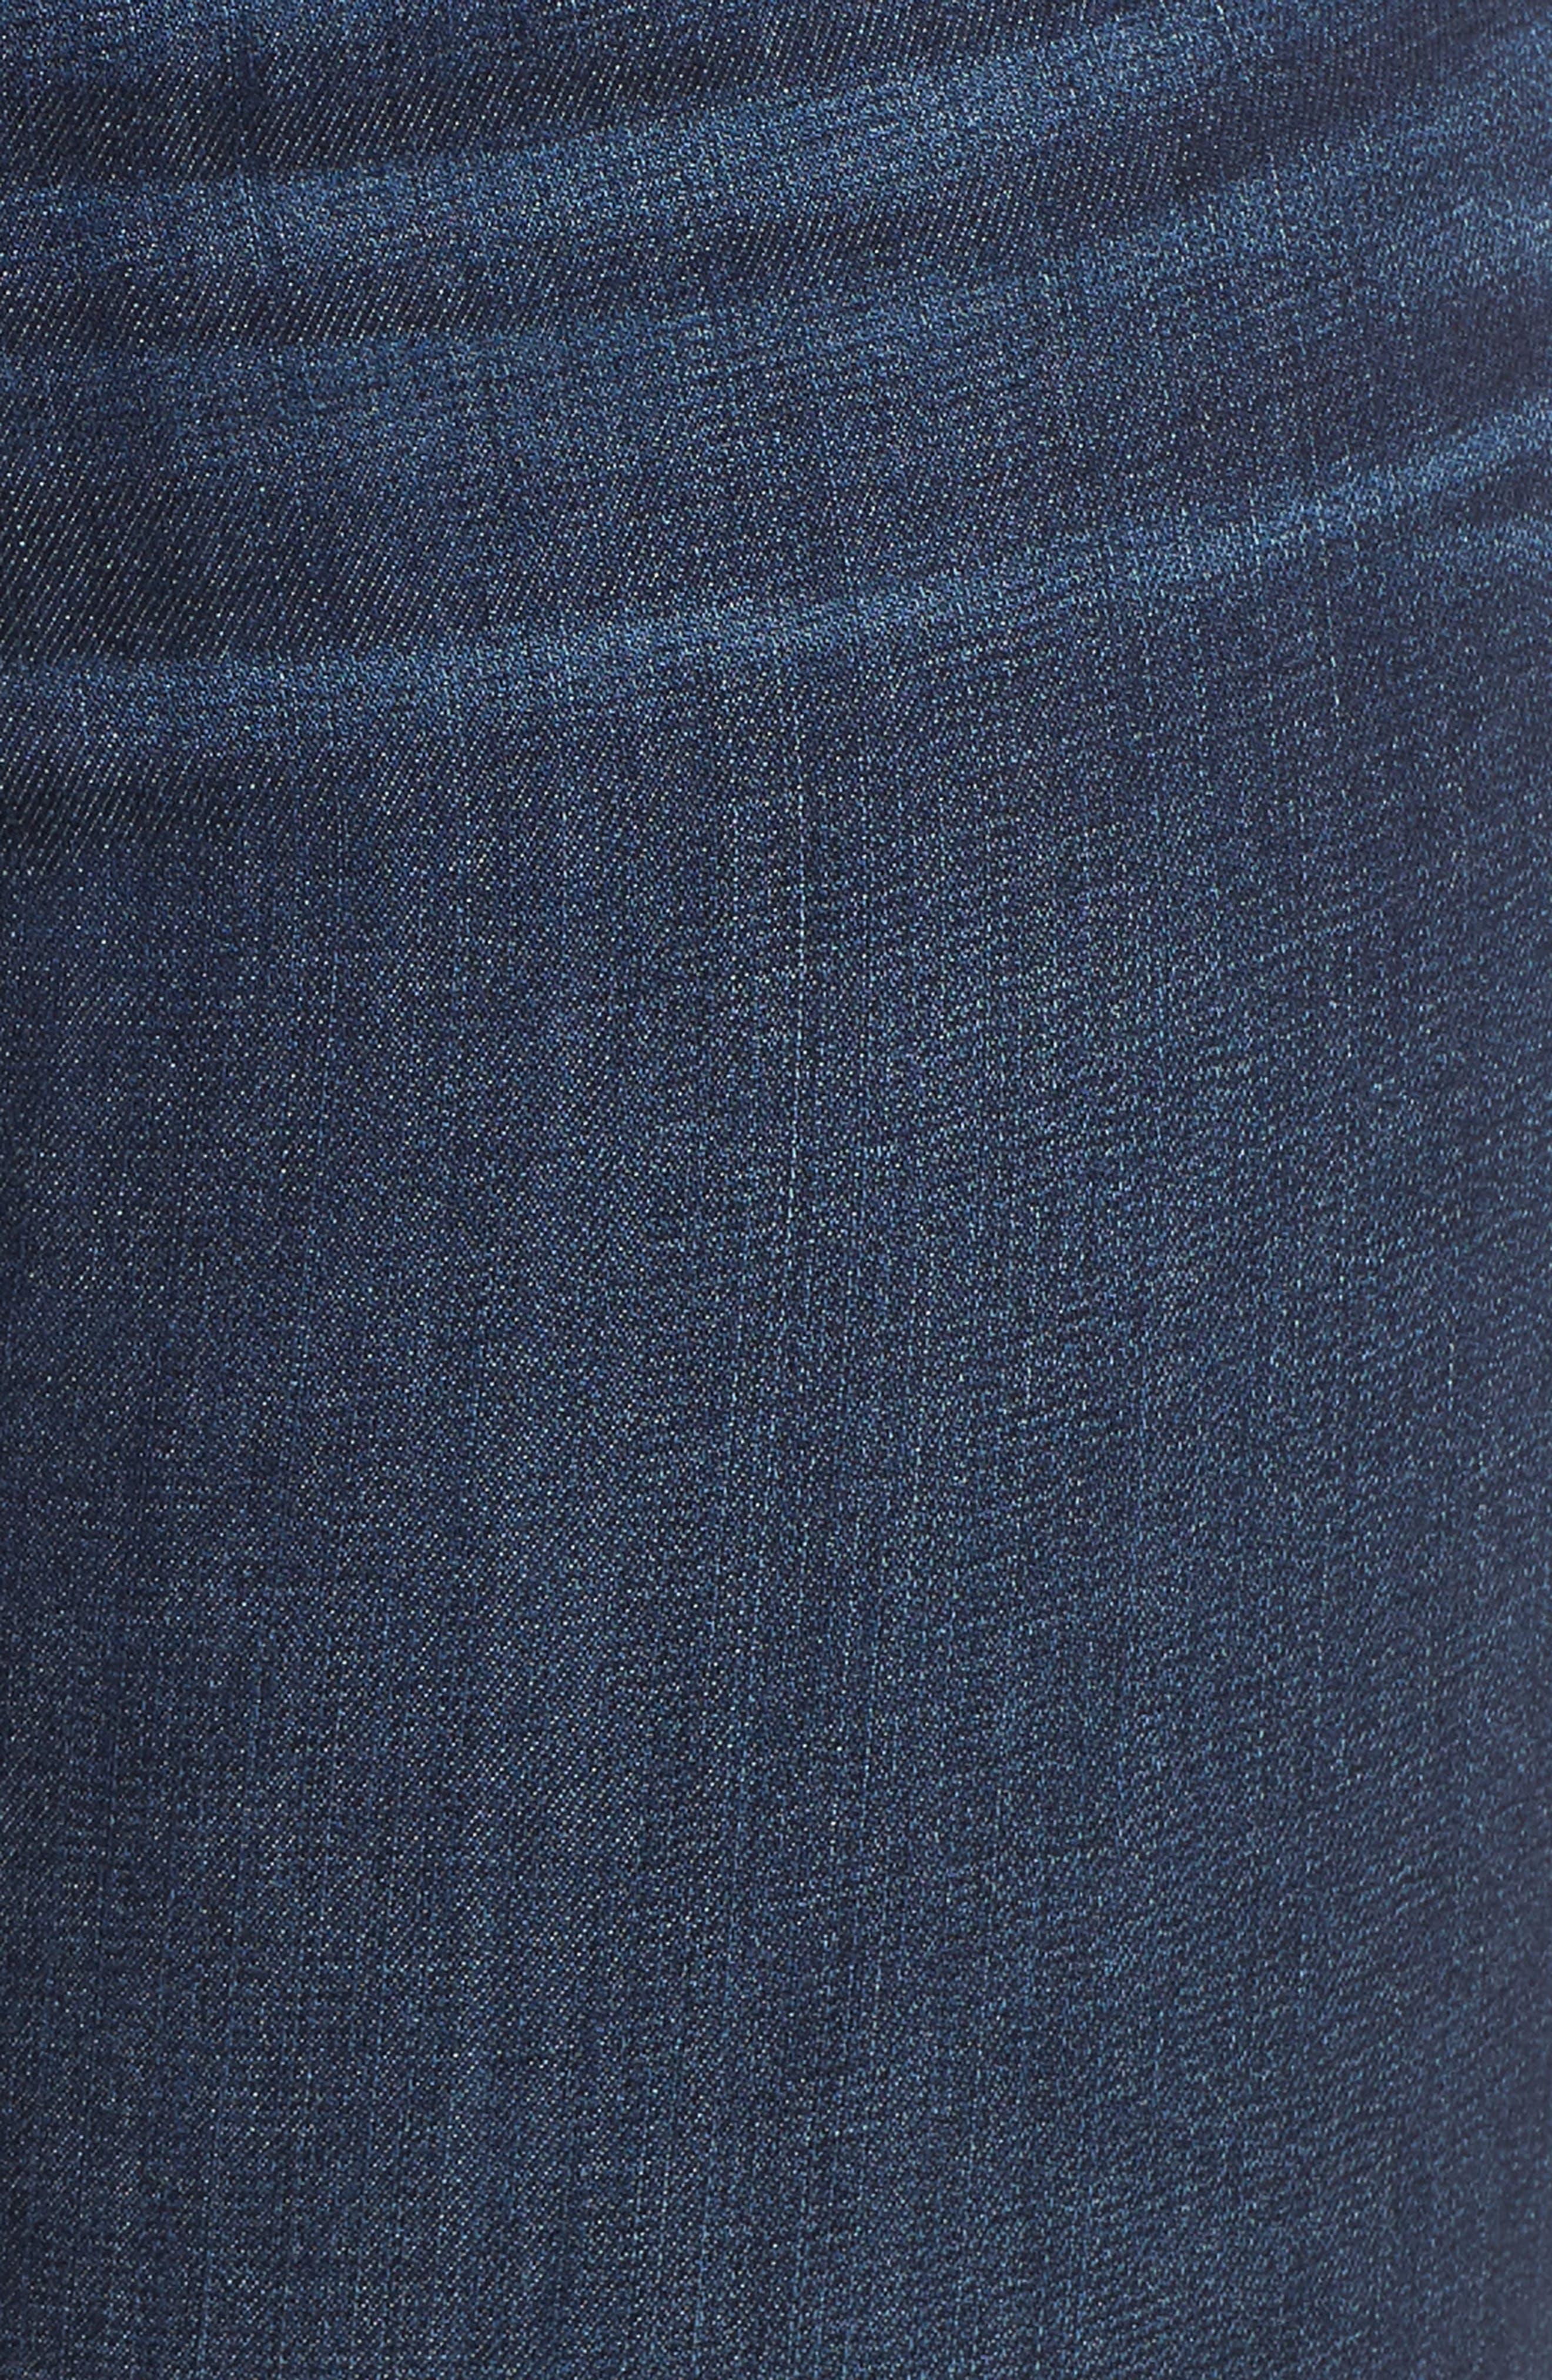 Stretch Skinny Jeans,                             Alternate thumbnail 6, color,                             MEDIUM WASH